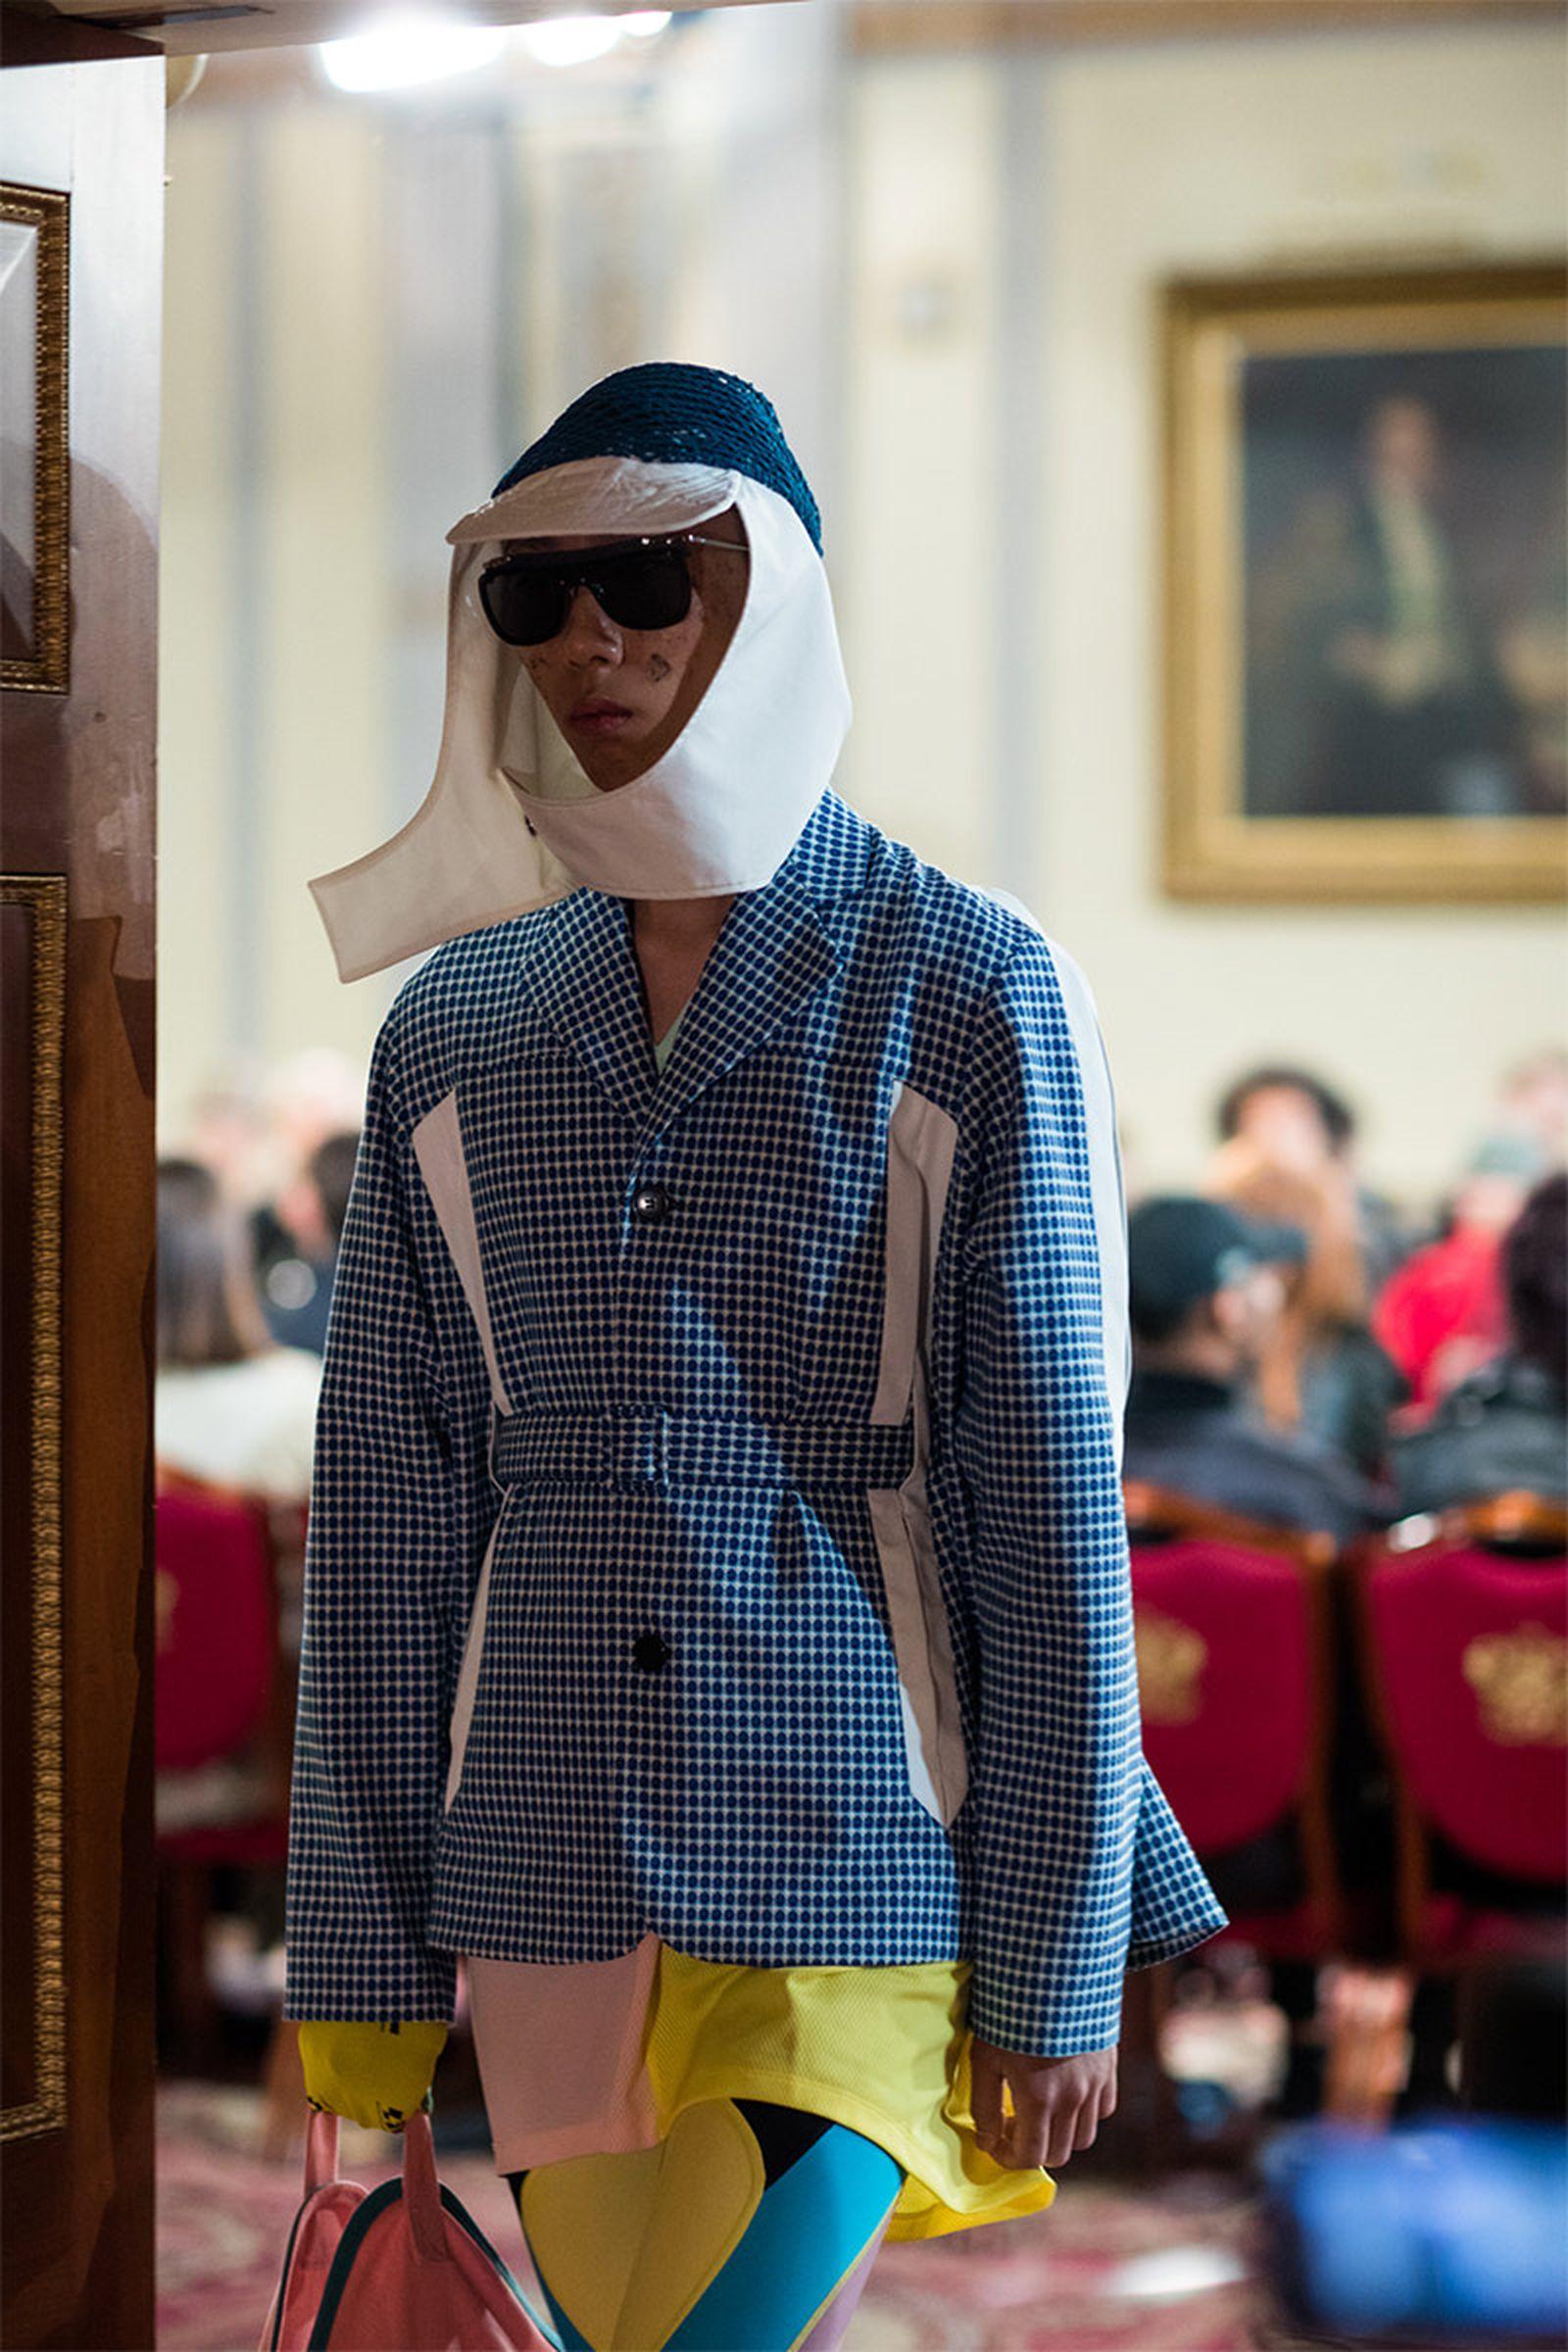 kiko kostadinov asics ss20 asics x kiko kostadinov london fashion week ss2020